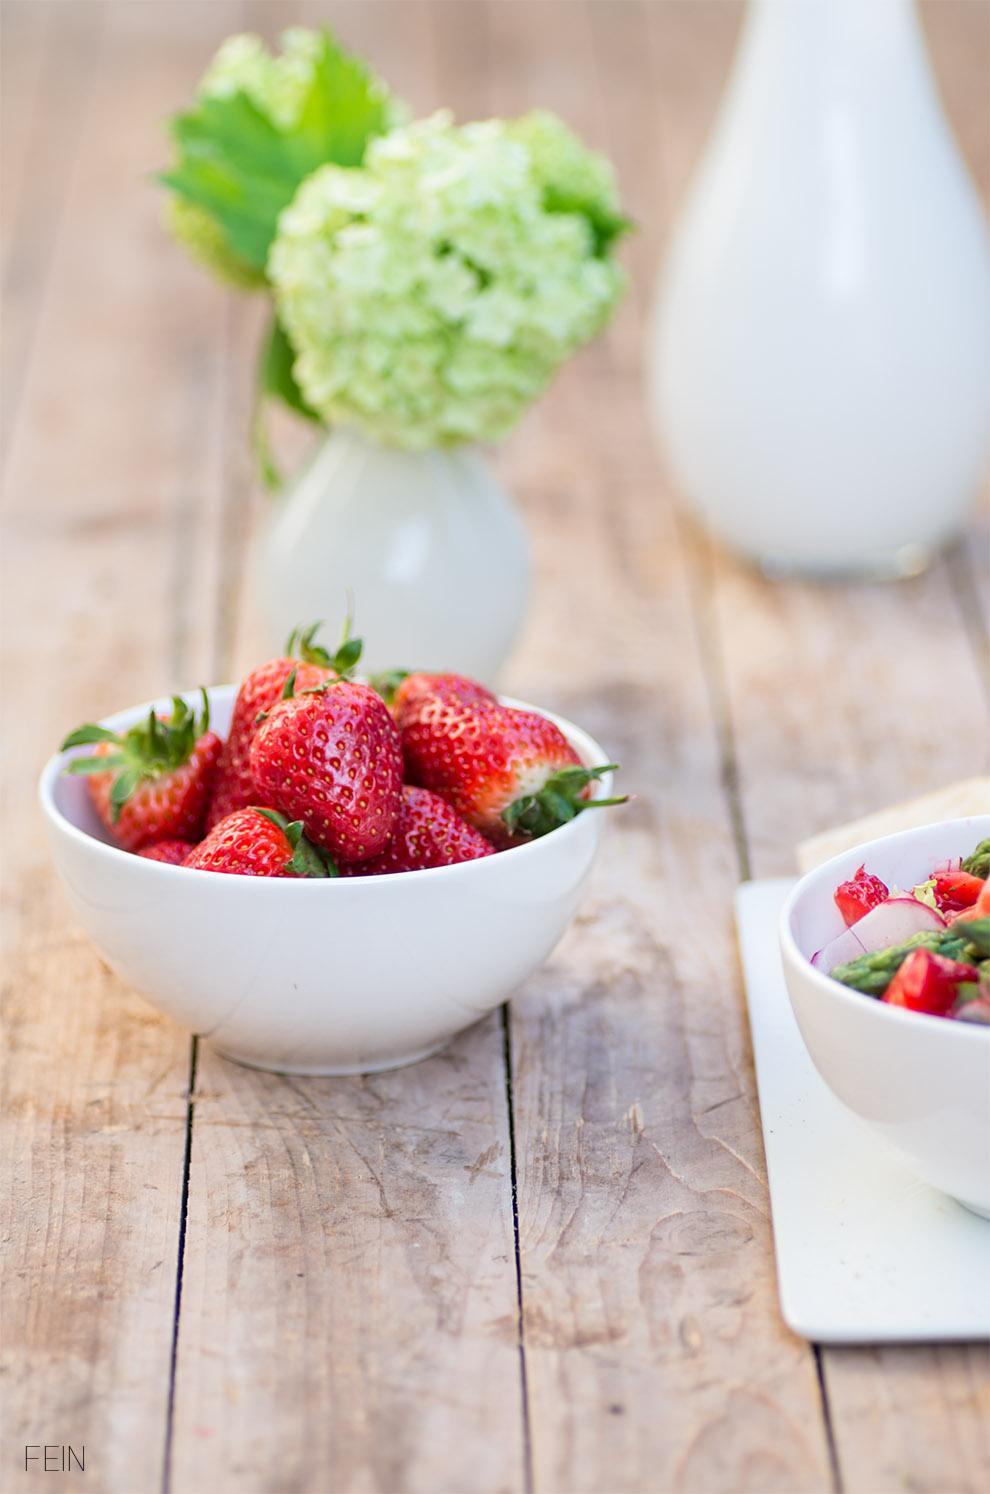 gr ner spargelsalat mit erdbeeren fein und fabelhaft. Black Bedroom Furniture Sets. Home Design Ideas